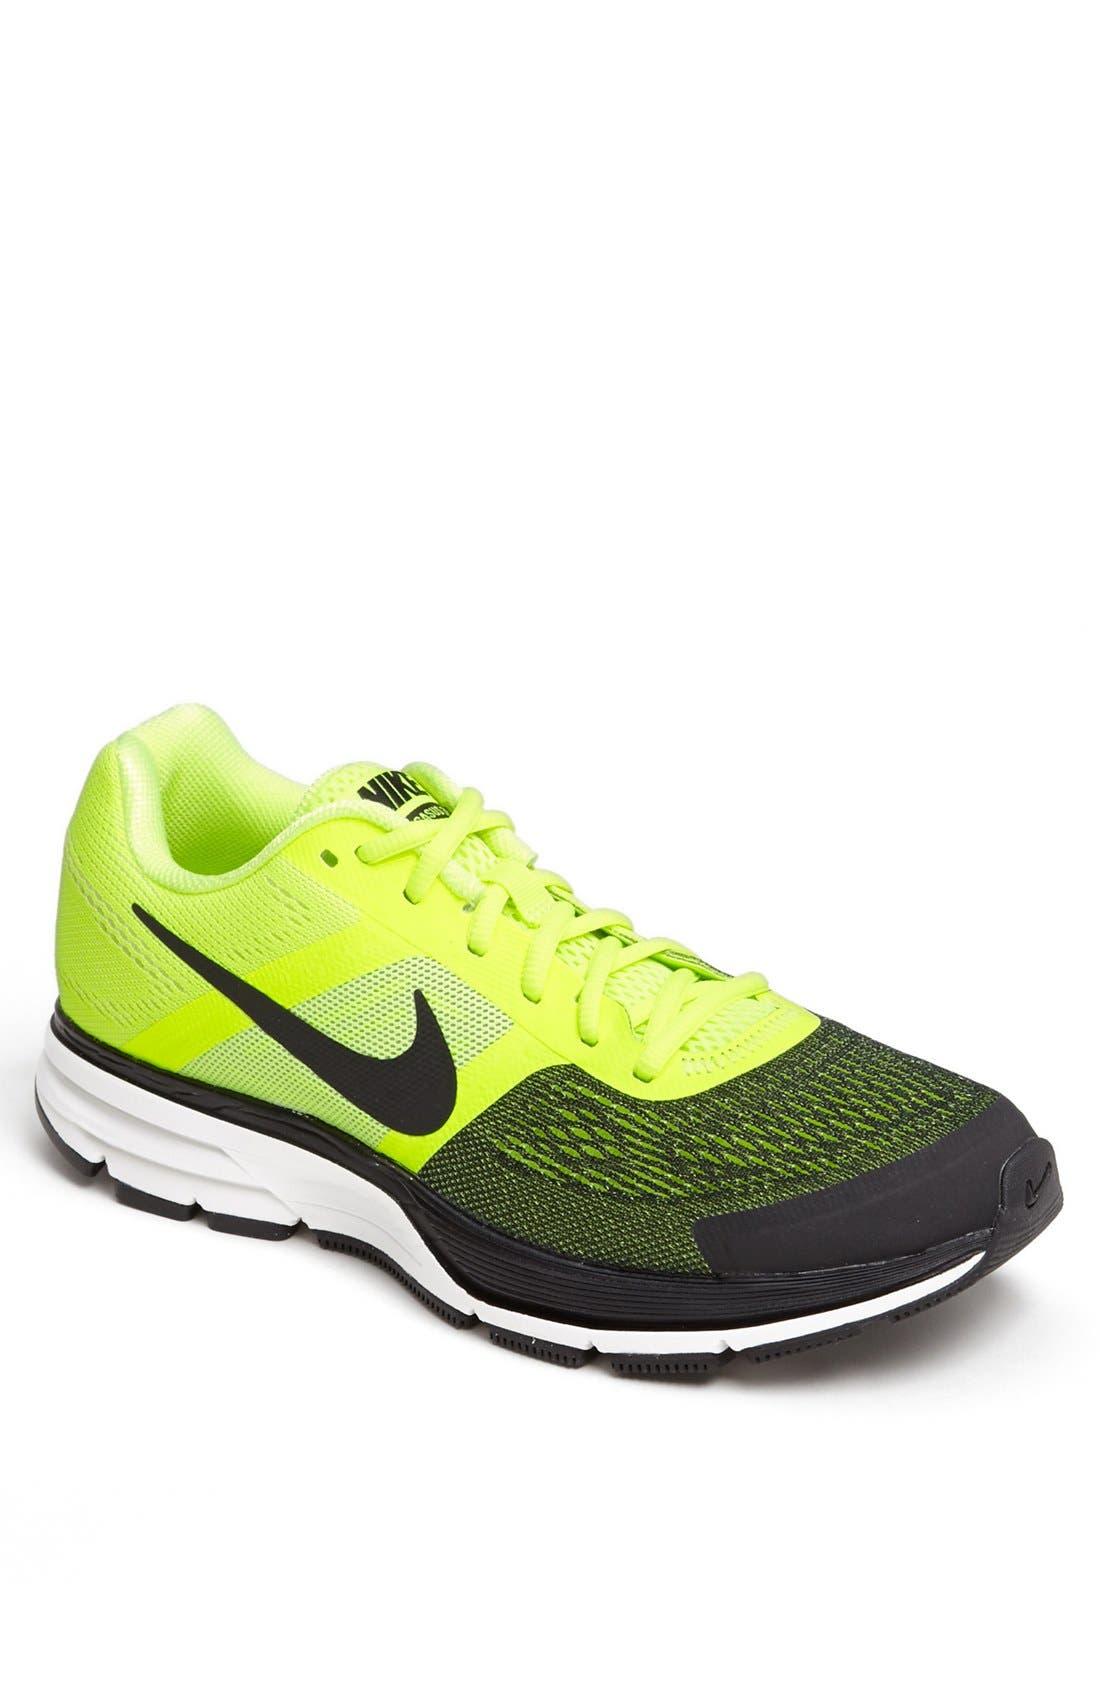 Main Image - Nike 'Air Pegasus+ 30' Running Shoe (Men)